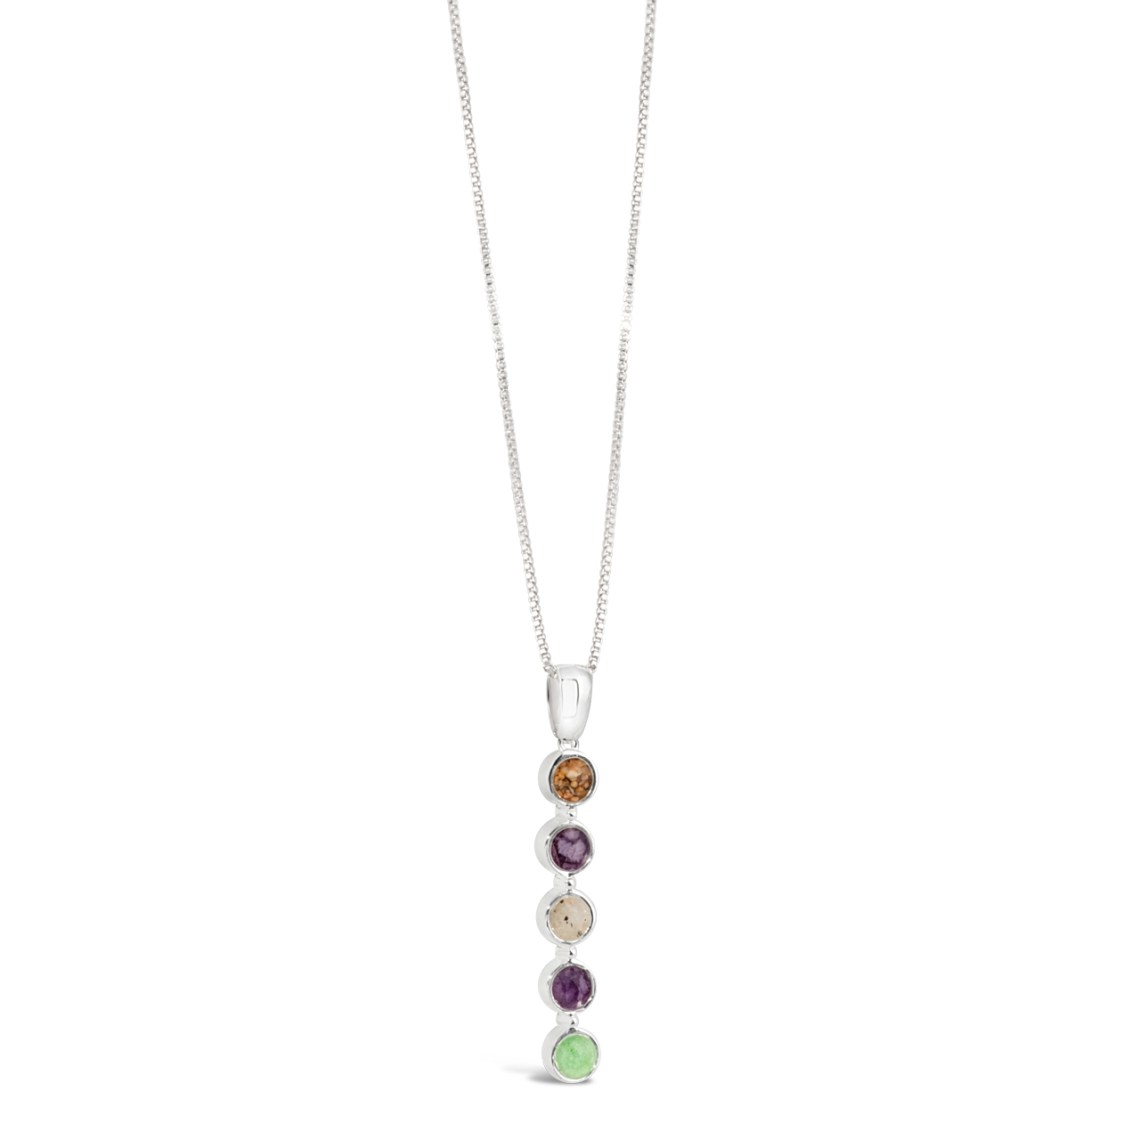 Endless-Summer-Vertical-Bar-necklace-rgb-72dpi-WEB